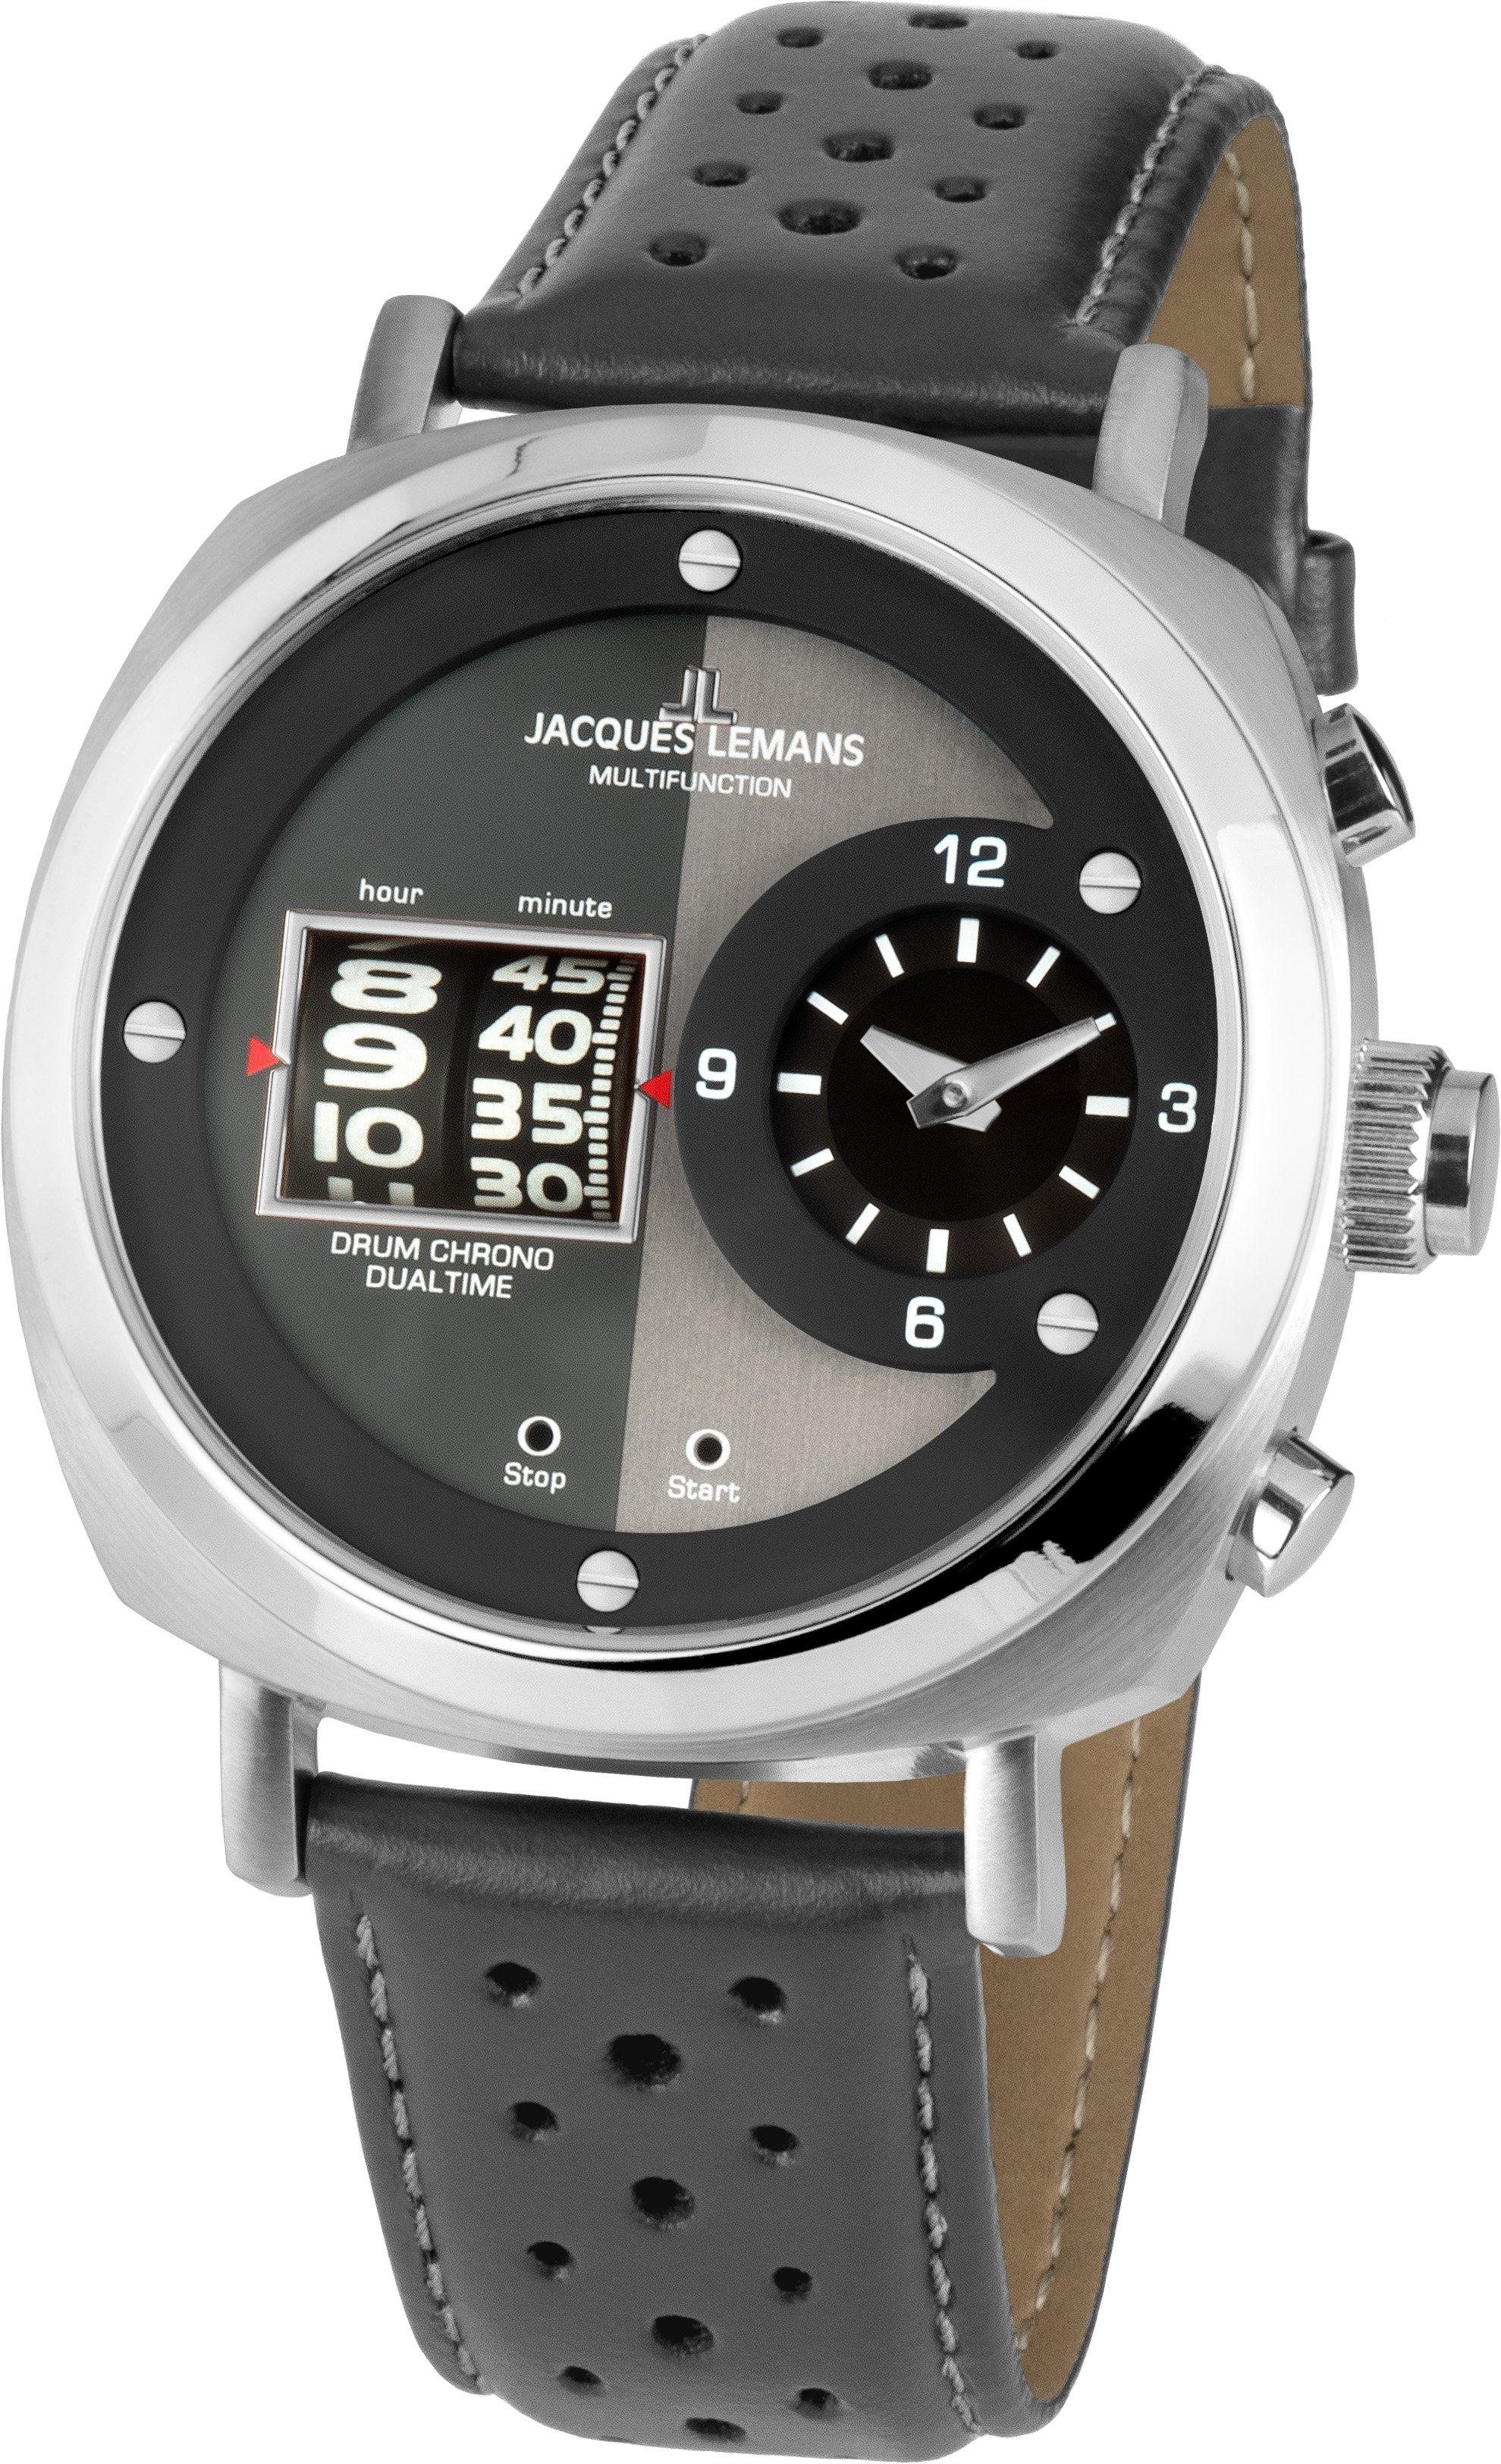 Jacques Lemans chronograaf Lugano, 1-2058A - gratis ruilen op otto.nl